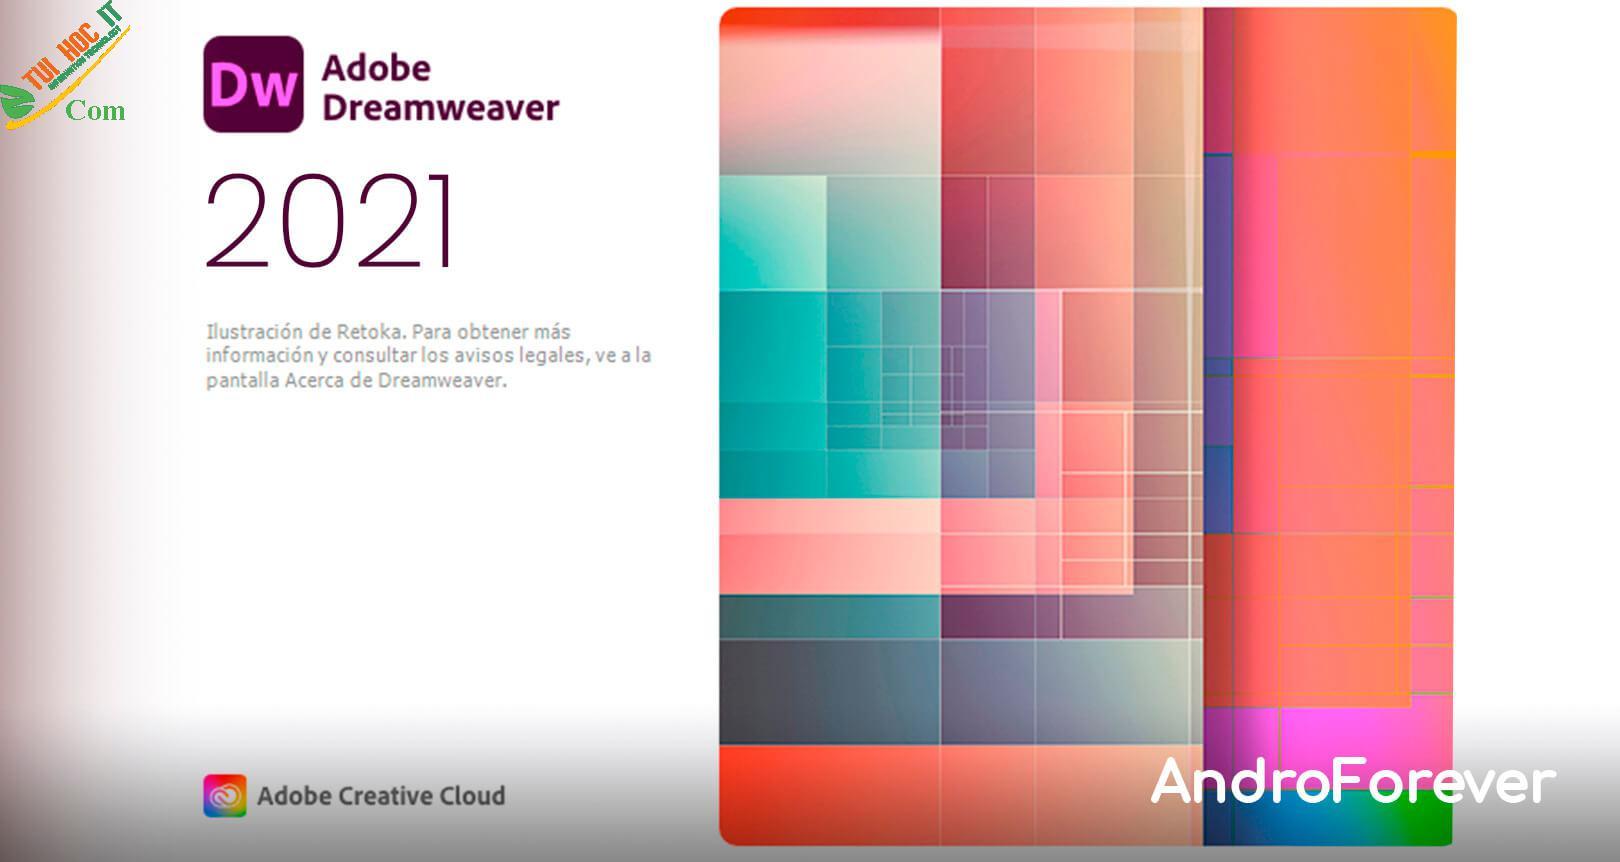 Download Adobe Dreamweaver CC 2021-repack vĩnh viễn 100% 2